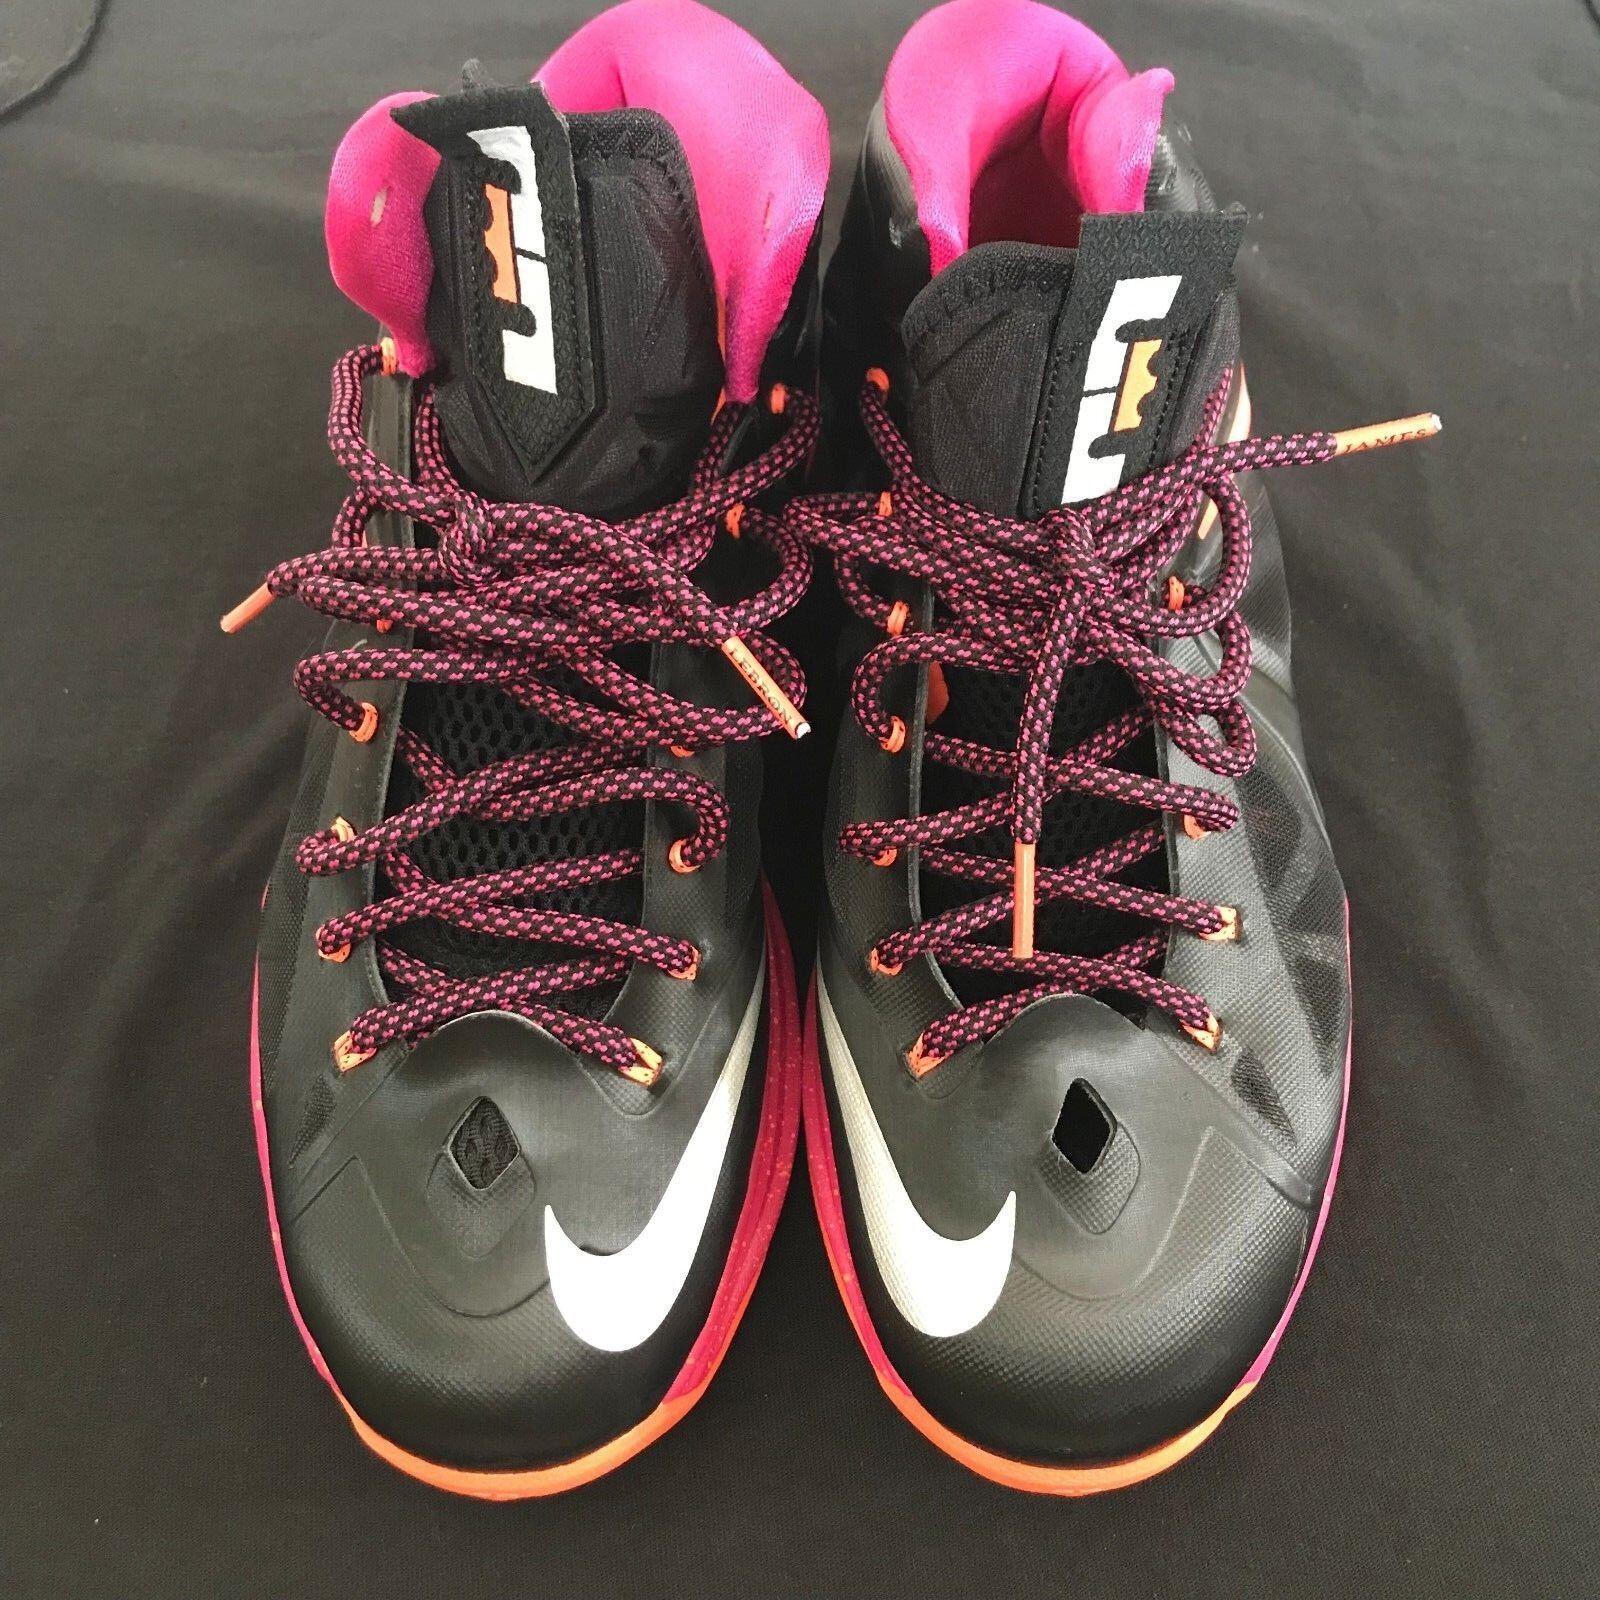 Nike LeBron 10 Floridians Size 10